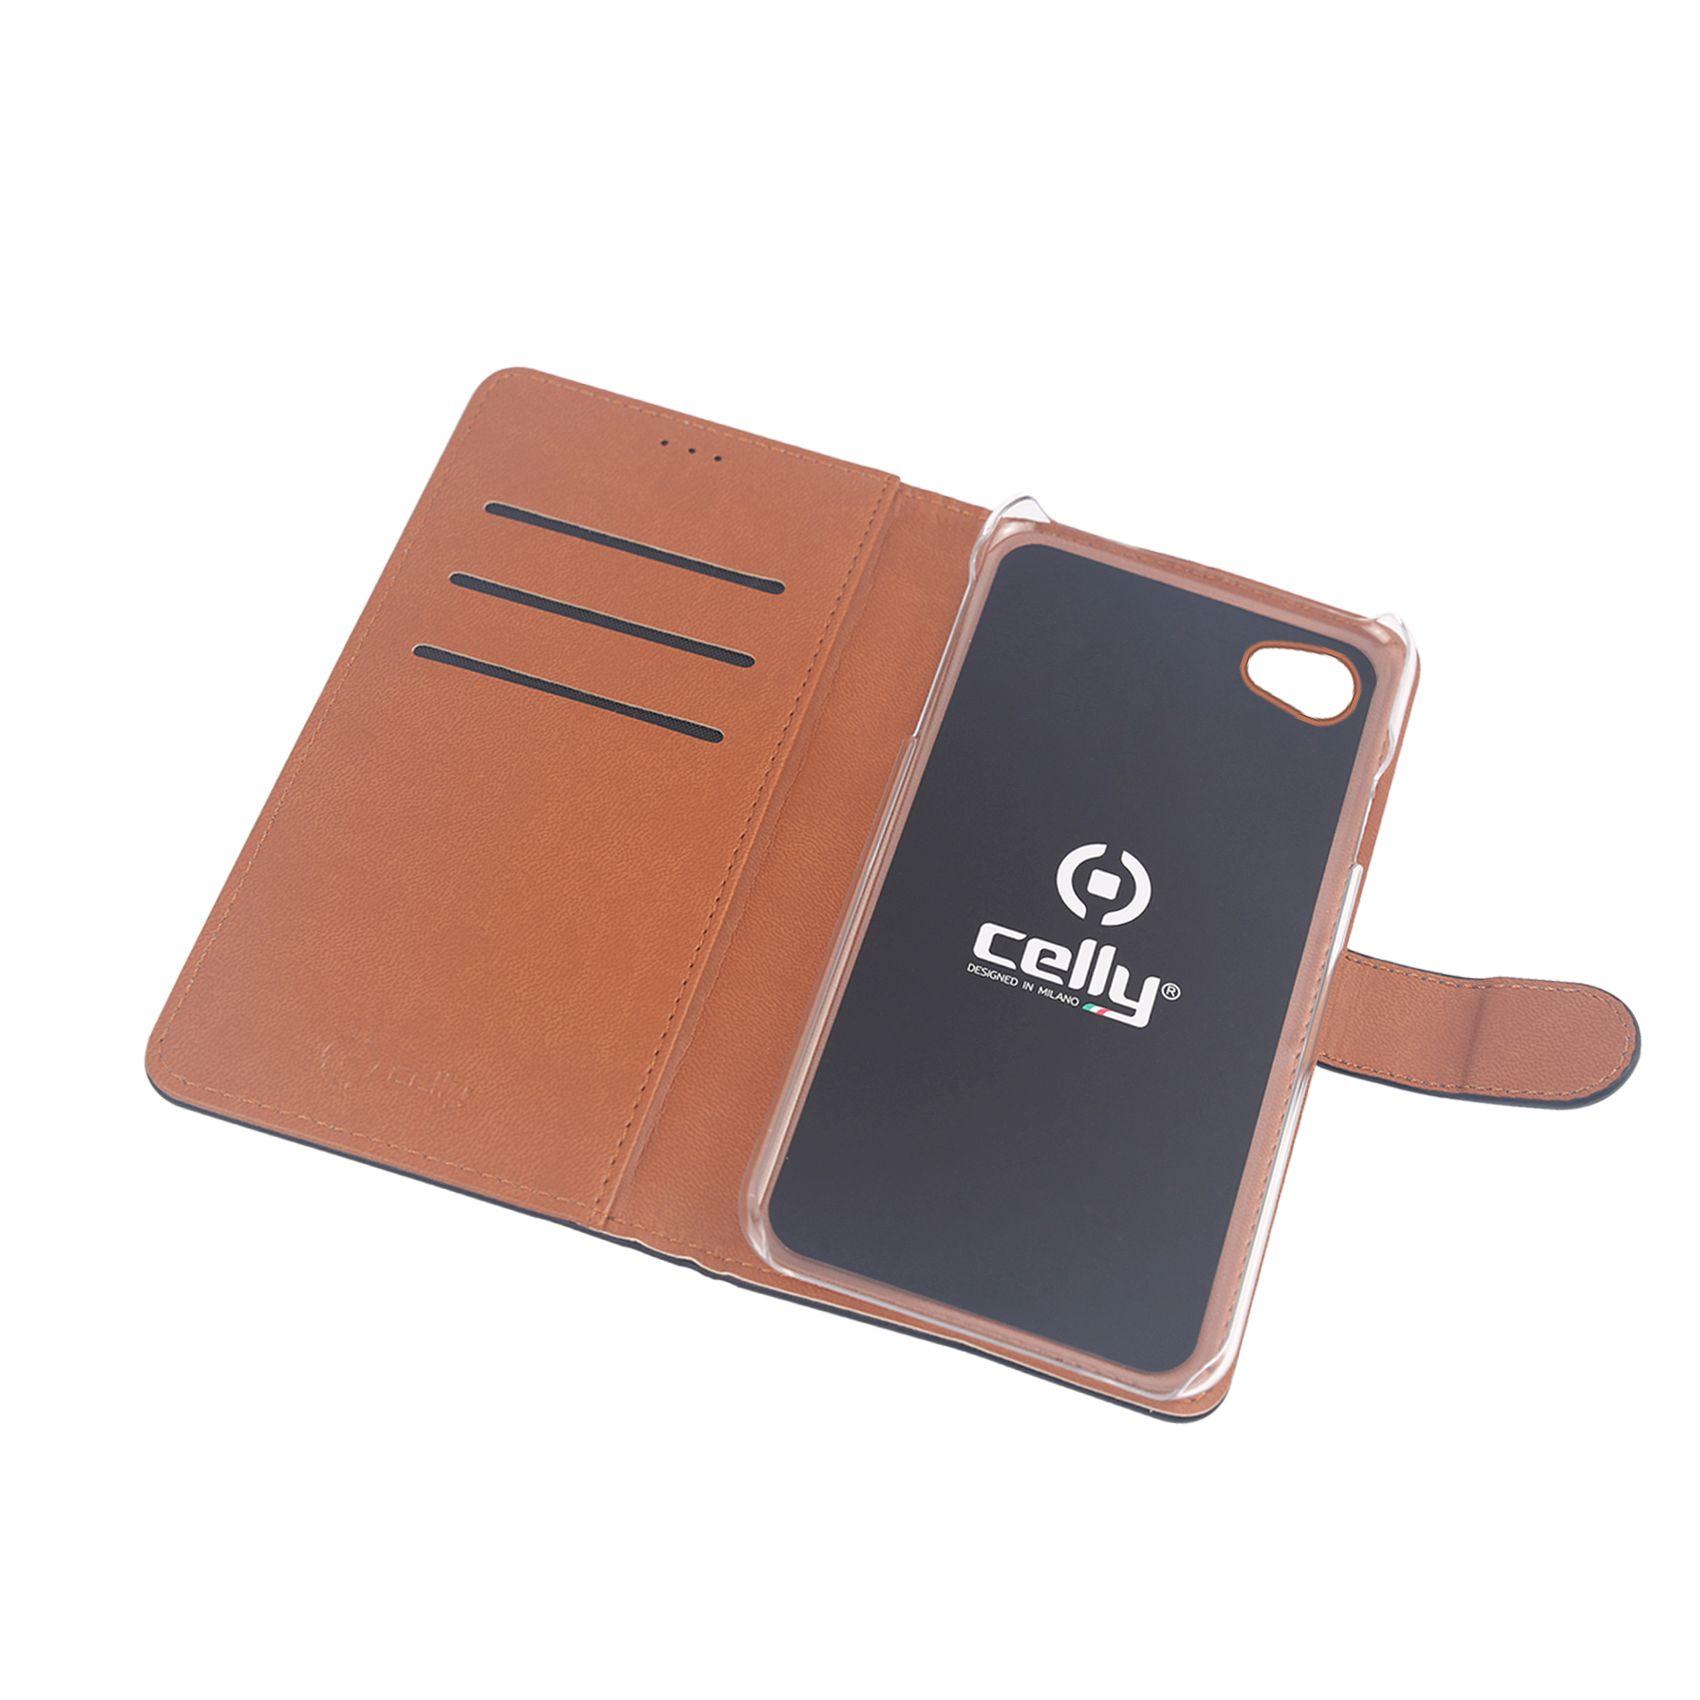 Pouzdro typu kniha CELLY Wally pro Xiaomi Redmi 5A, PU kůže, černé